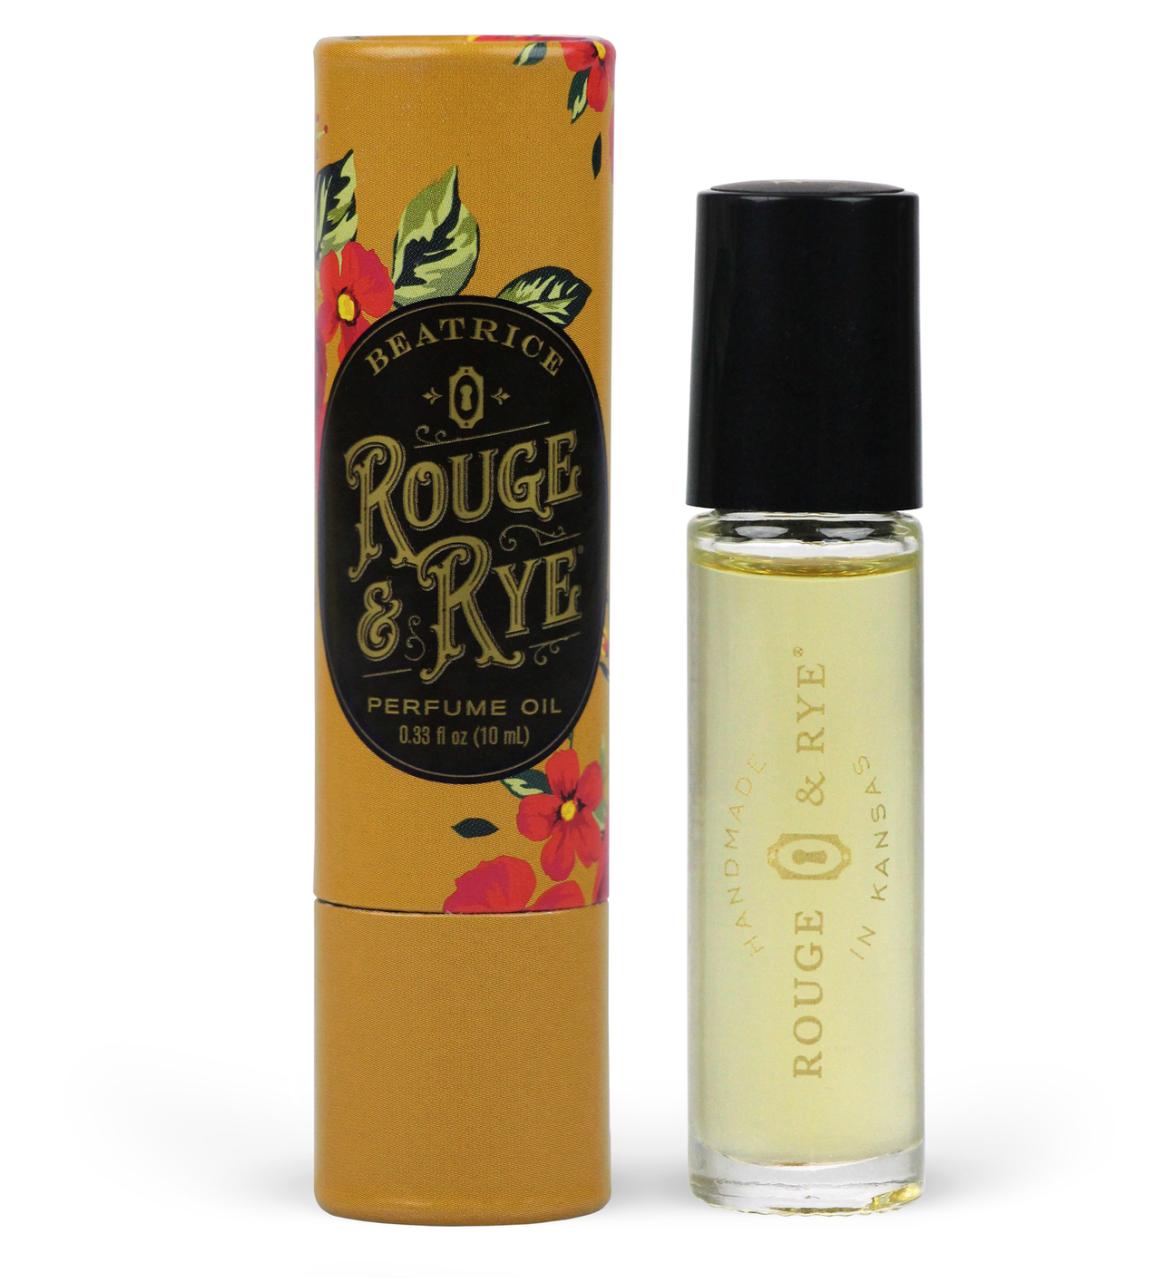 Rouge & Rye Beatrice Perfume Oil-Coconut Caramel Rose